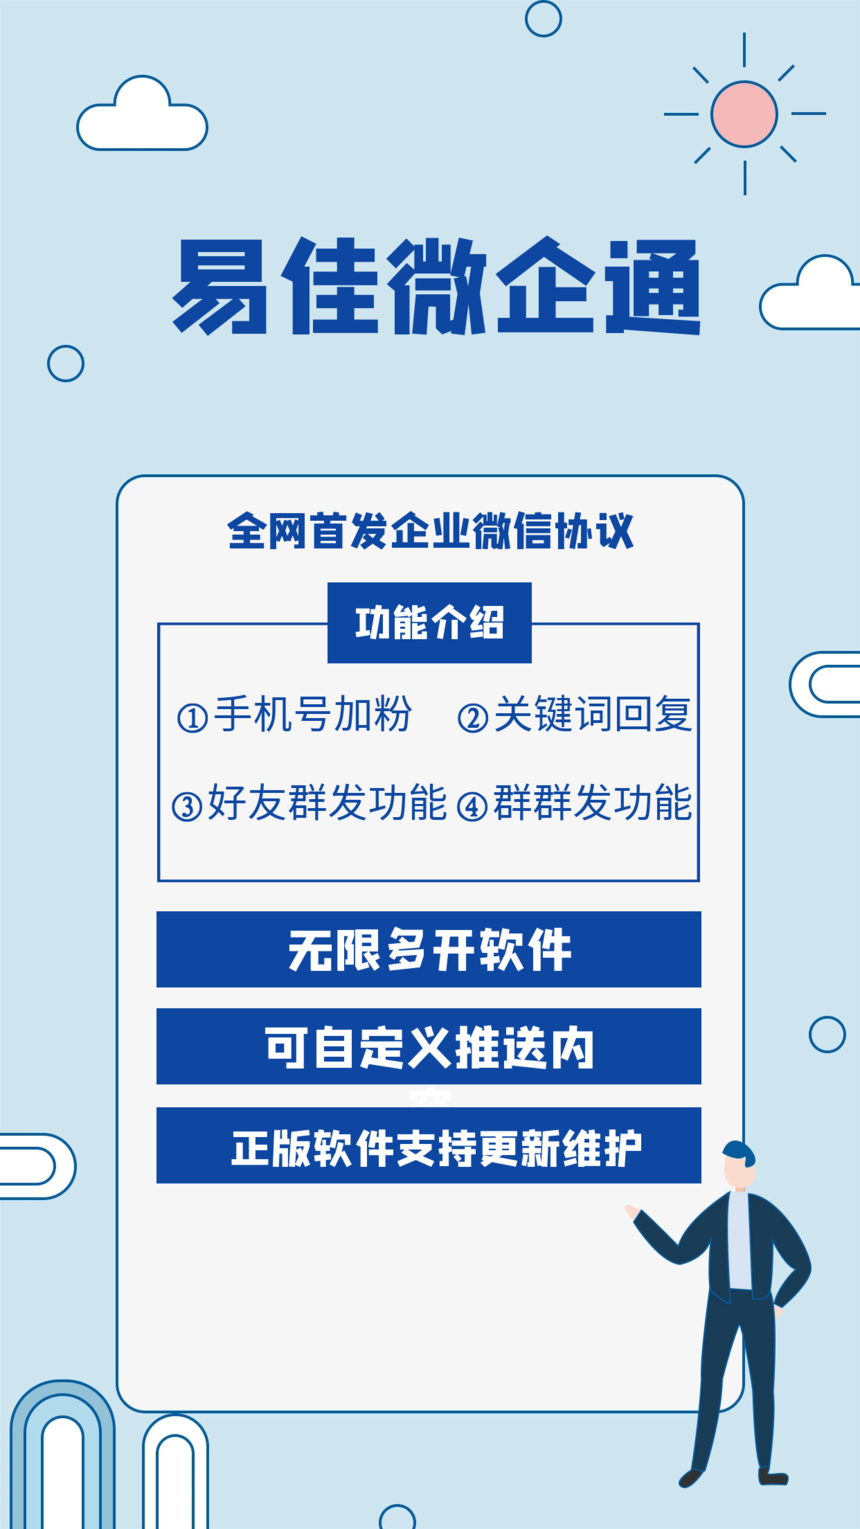 770e23a586a05423efb4ec86f77e68a5_yijia.png